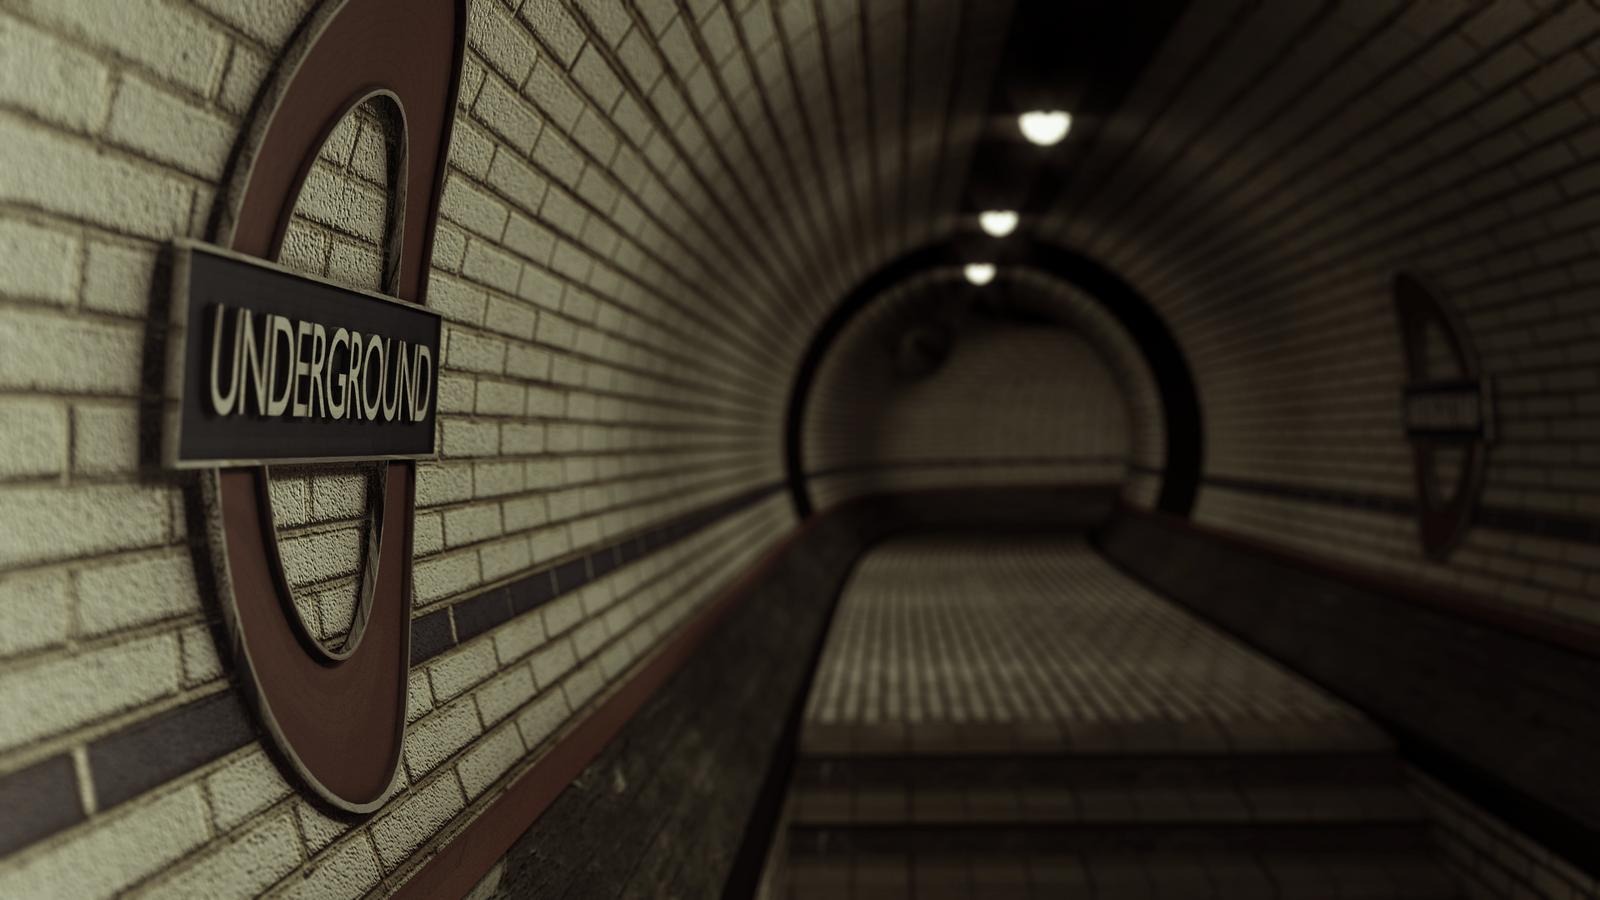 London Undergro... Underground